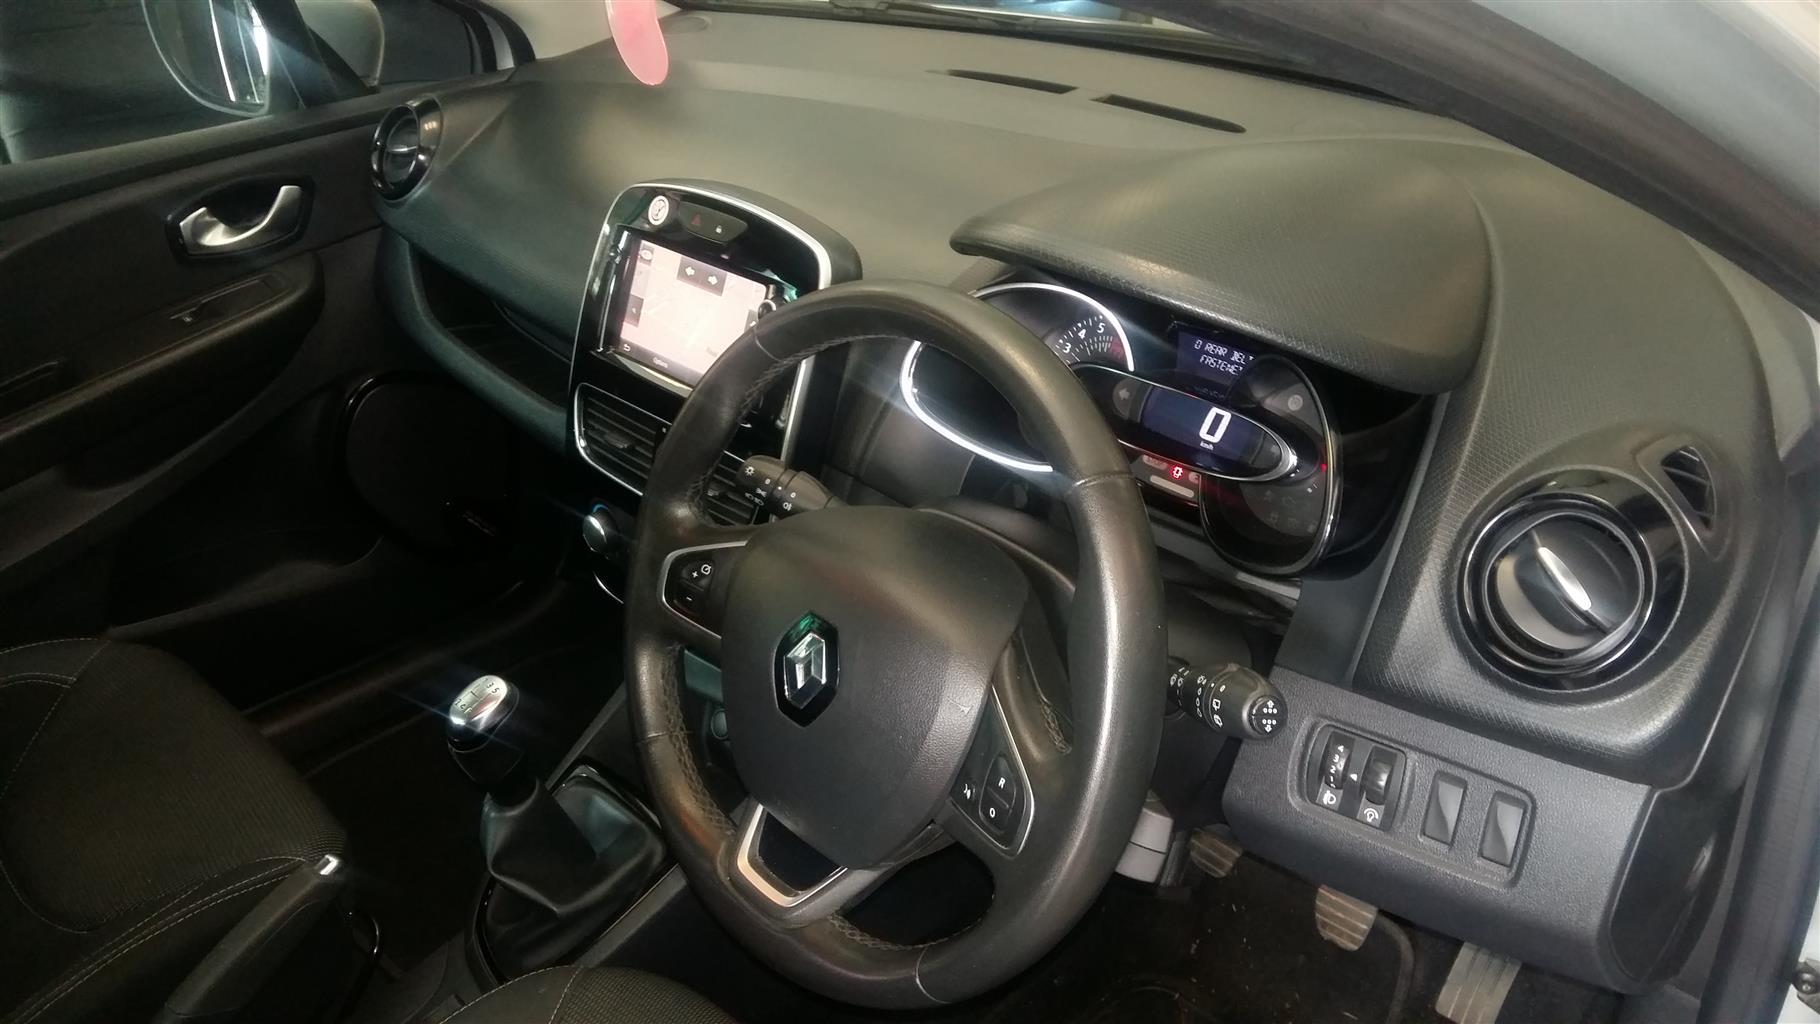 2008 Renault Clio 66kW turbo Expression